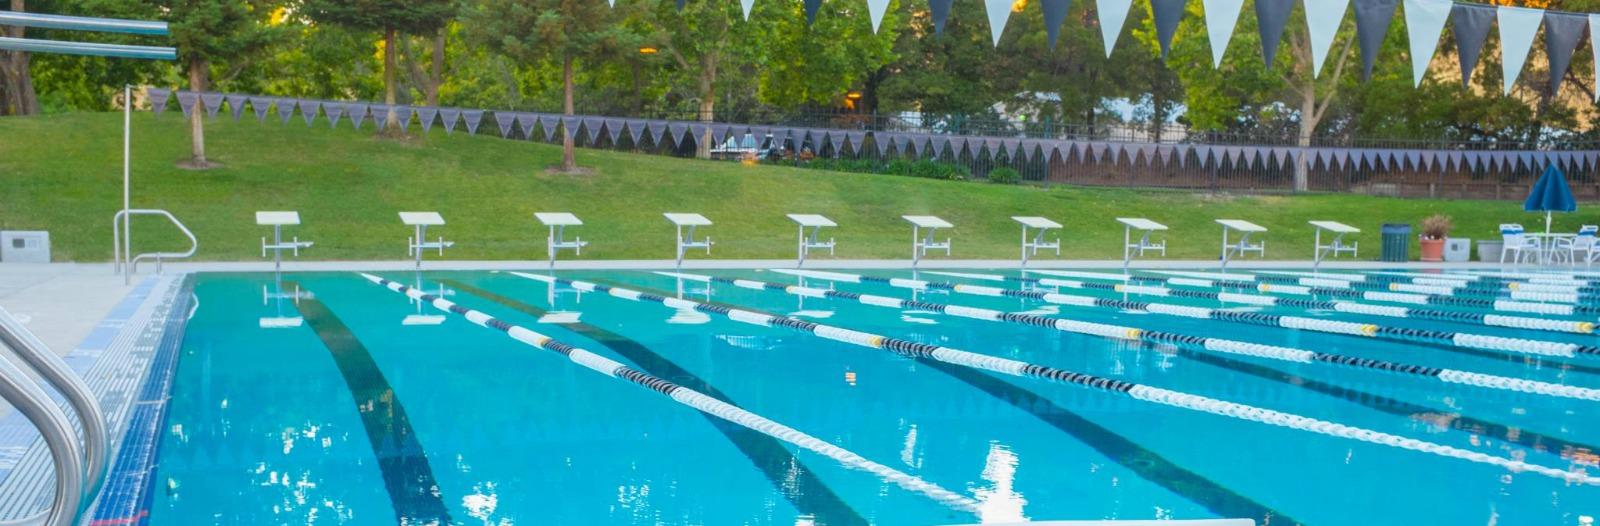 Danville Swim Teams for Kids